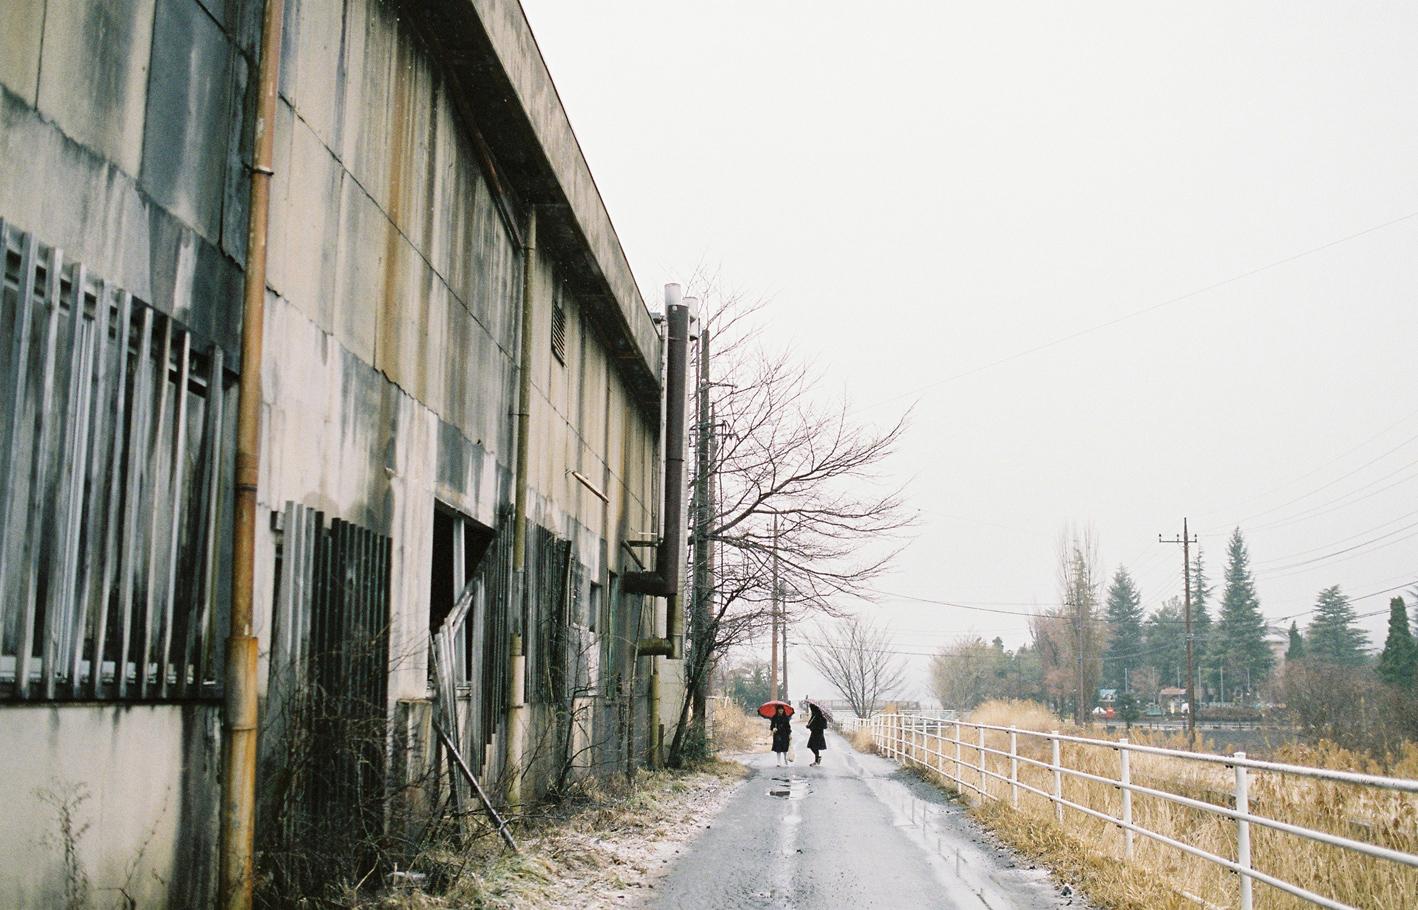 014-kawaguchiko-mount-fuji-japan-sophie-baker-photography